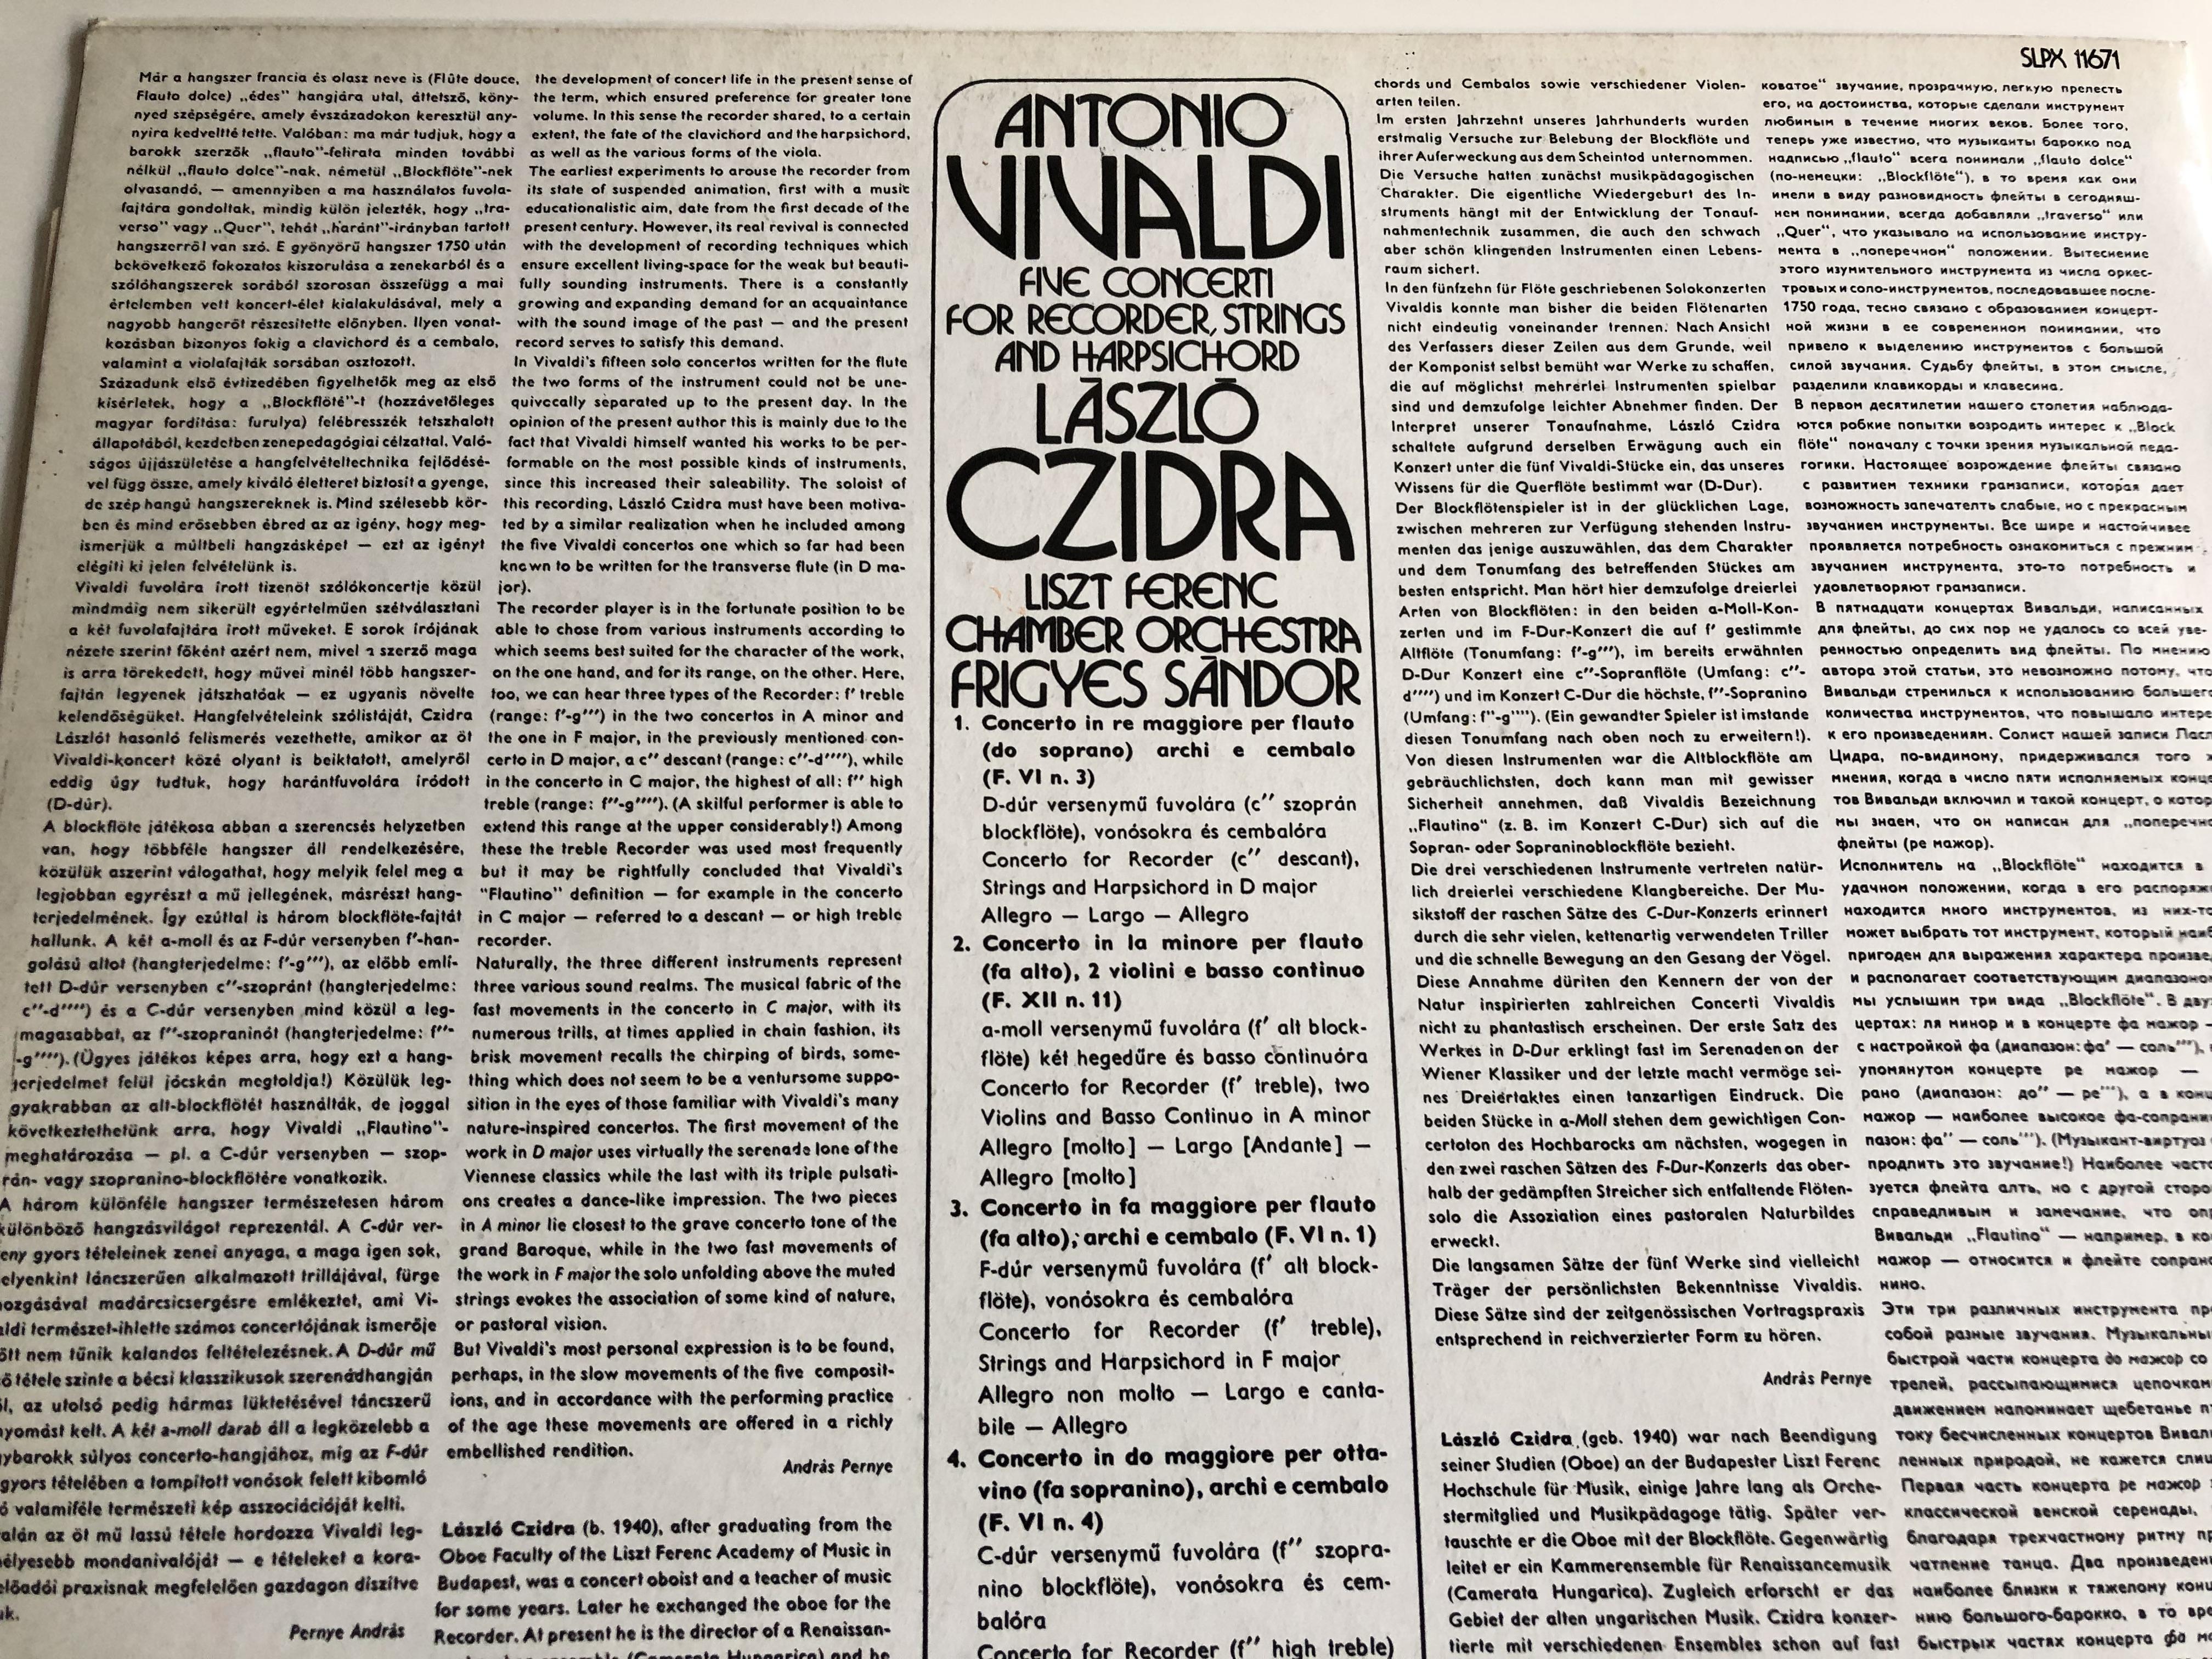 antonio-vivaldi-five-concerti-for-recorder-strings-and-harpsichord-conducted-frigyes-s-ndor-l-szl-czidra-liszt-ferenc-chamber-orchestra-hungaroton-lp-stereo-mono-slpx-11671-3-.jpg